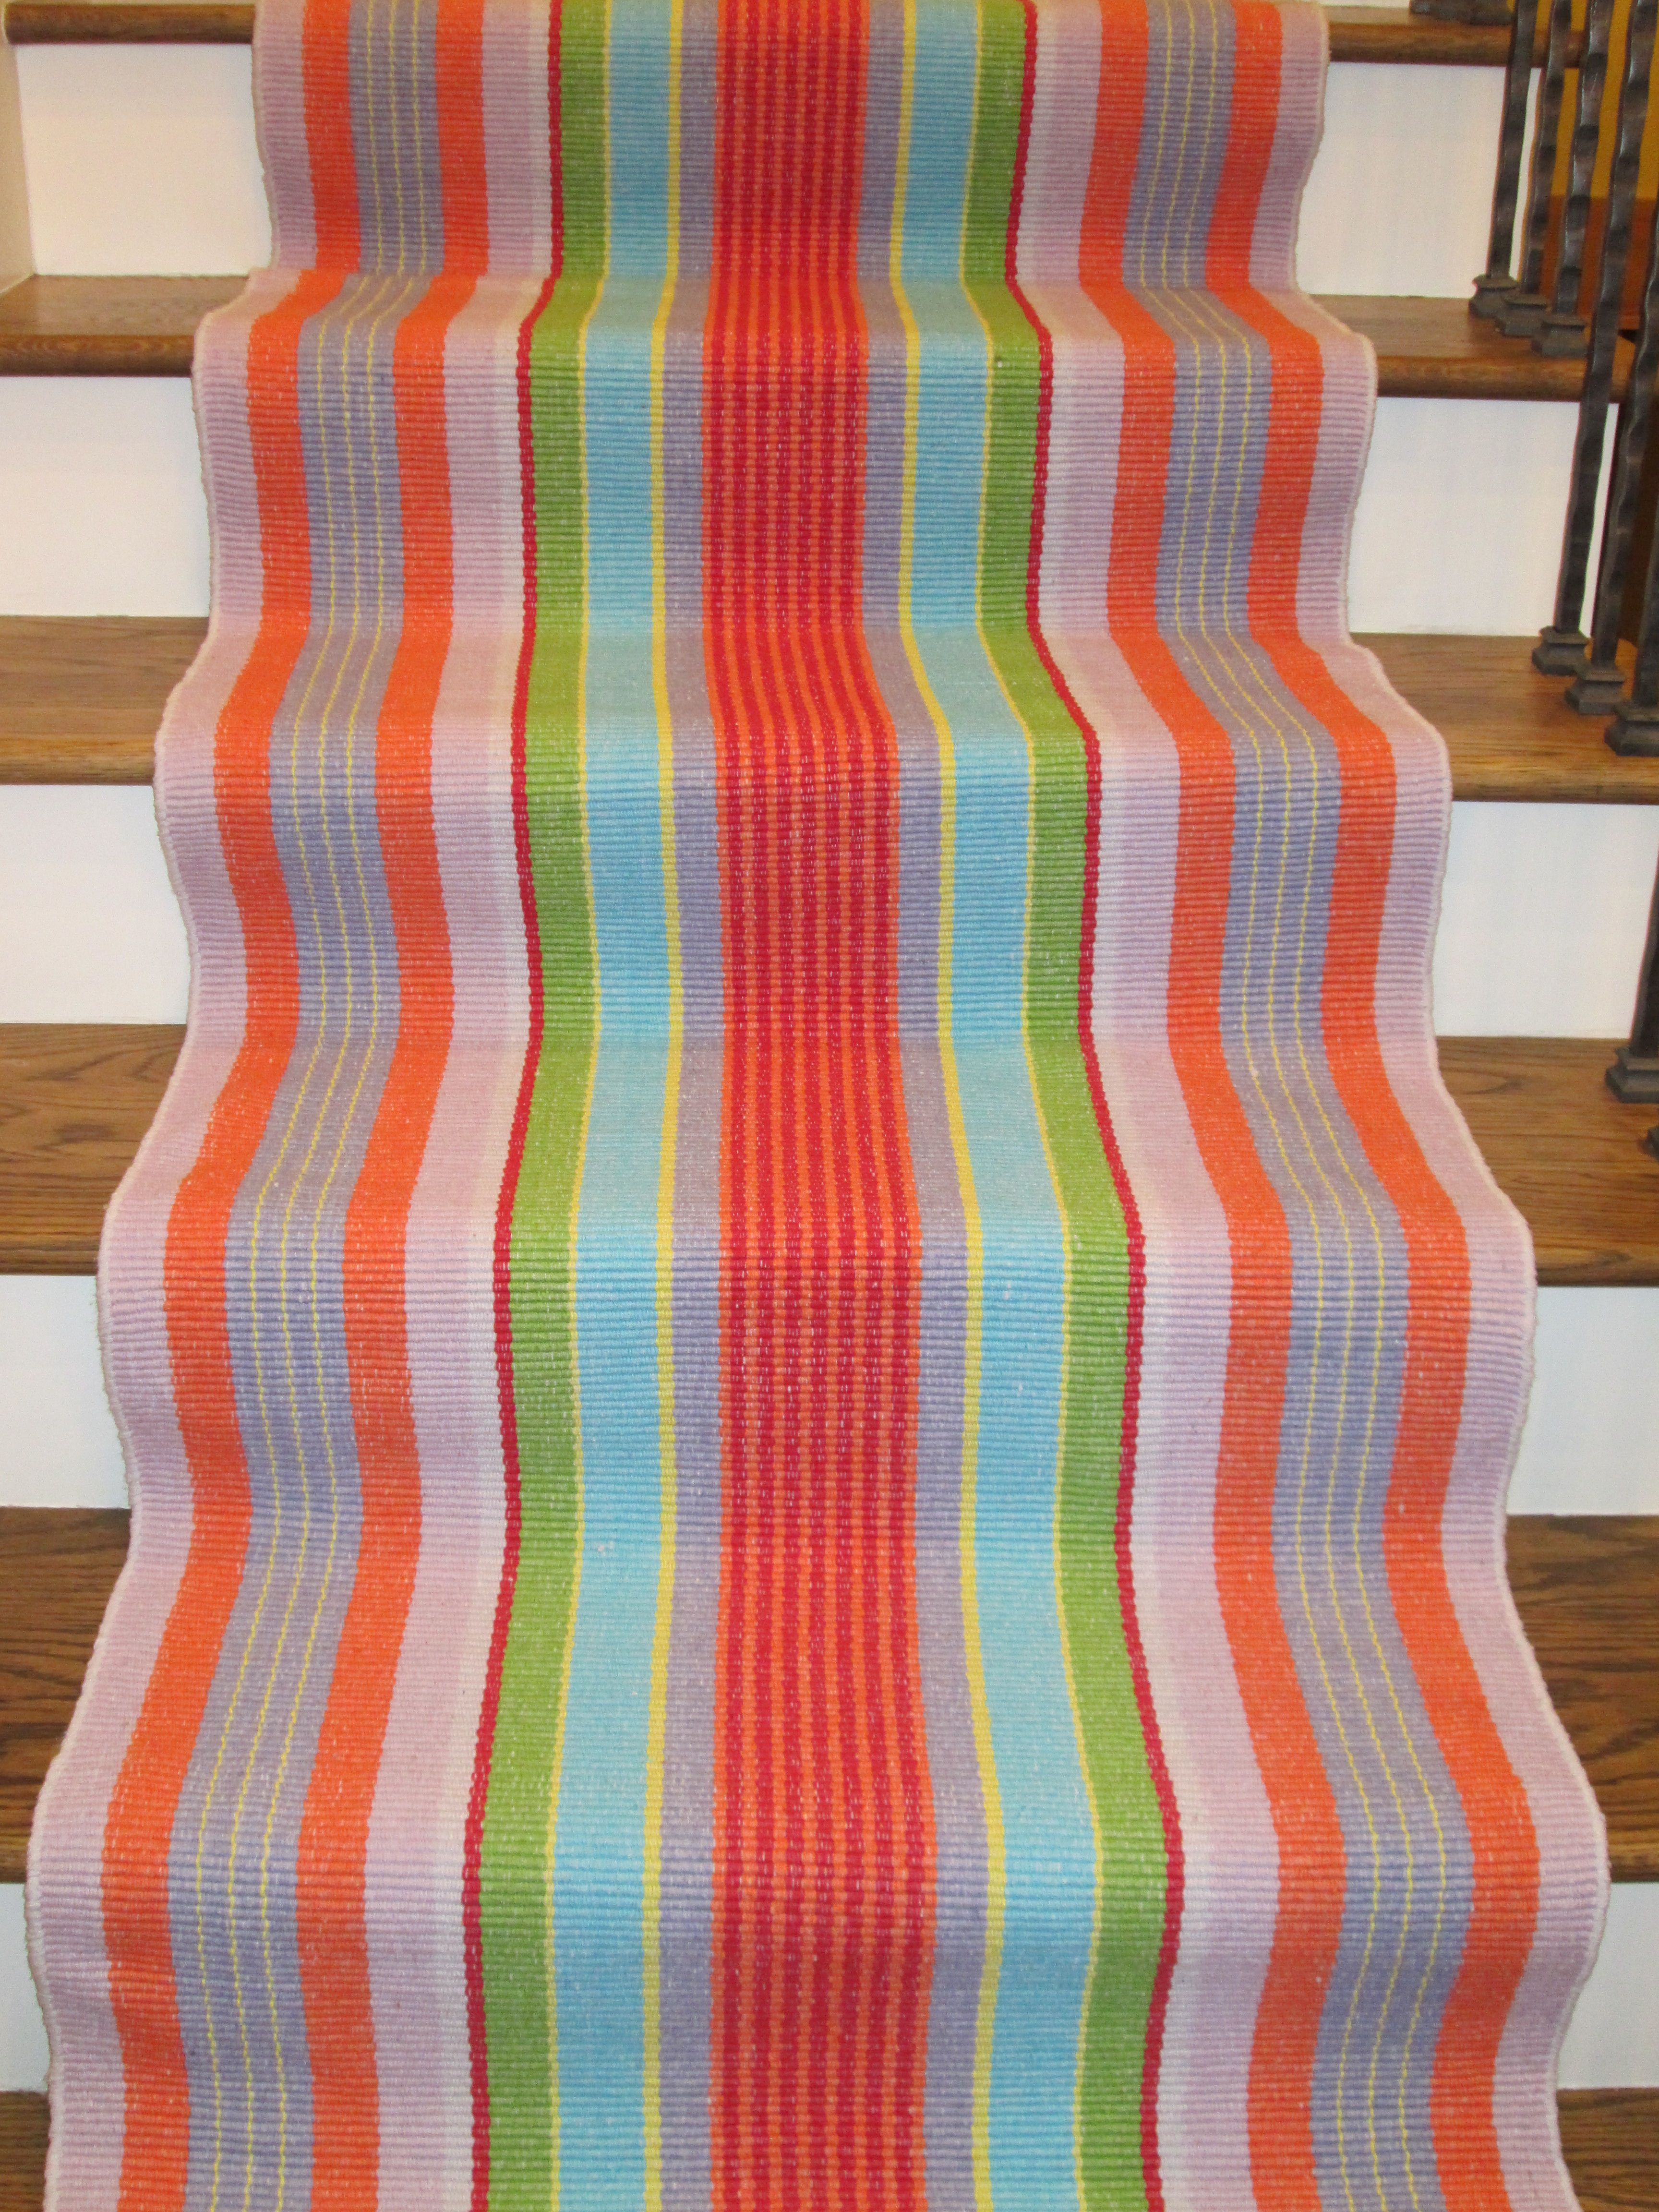 Dash And Albert Cotton Runners Colorful Fun Love It Garden Stripe 100 Woven